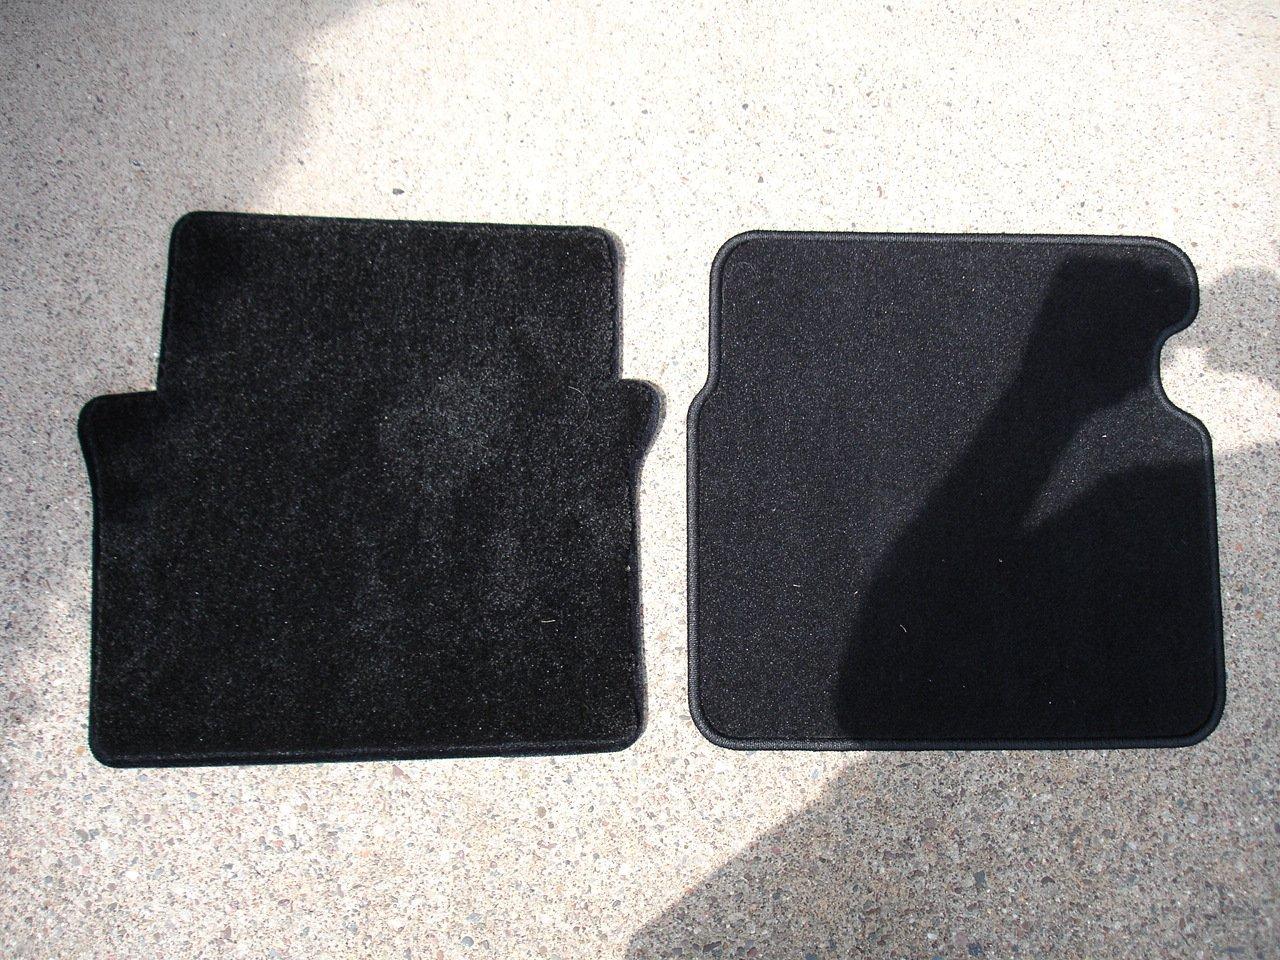 Lloyd Luxe Custom Fit Floor Mats 2013 200s Pictures Revies